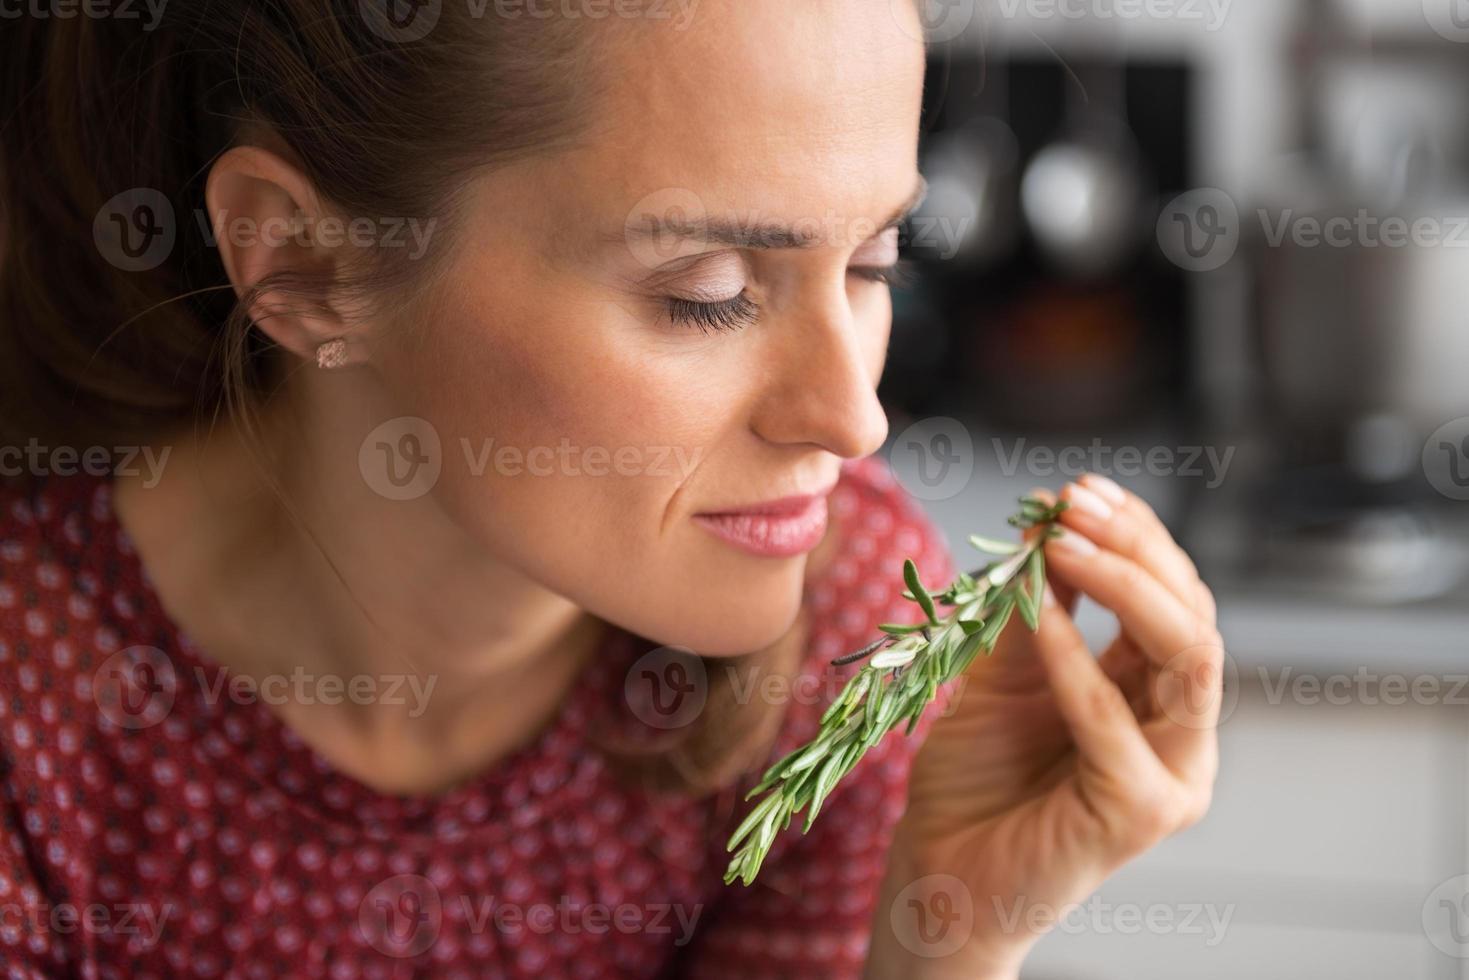 jovem dona de casa desfrutando rosmarinus fresco foto